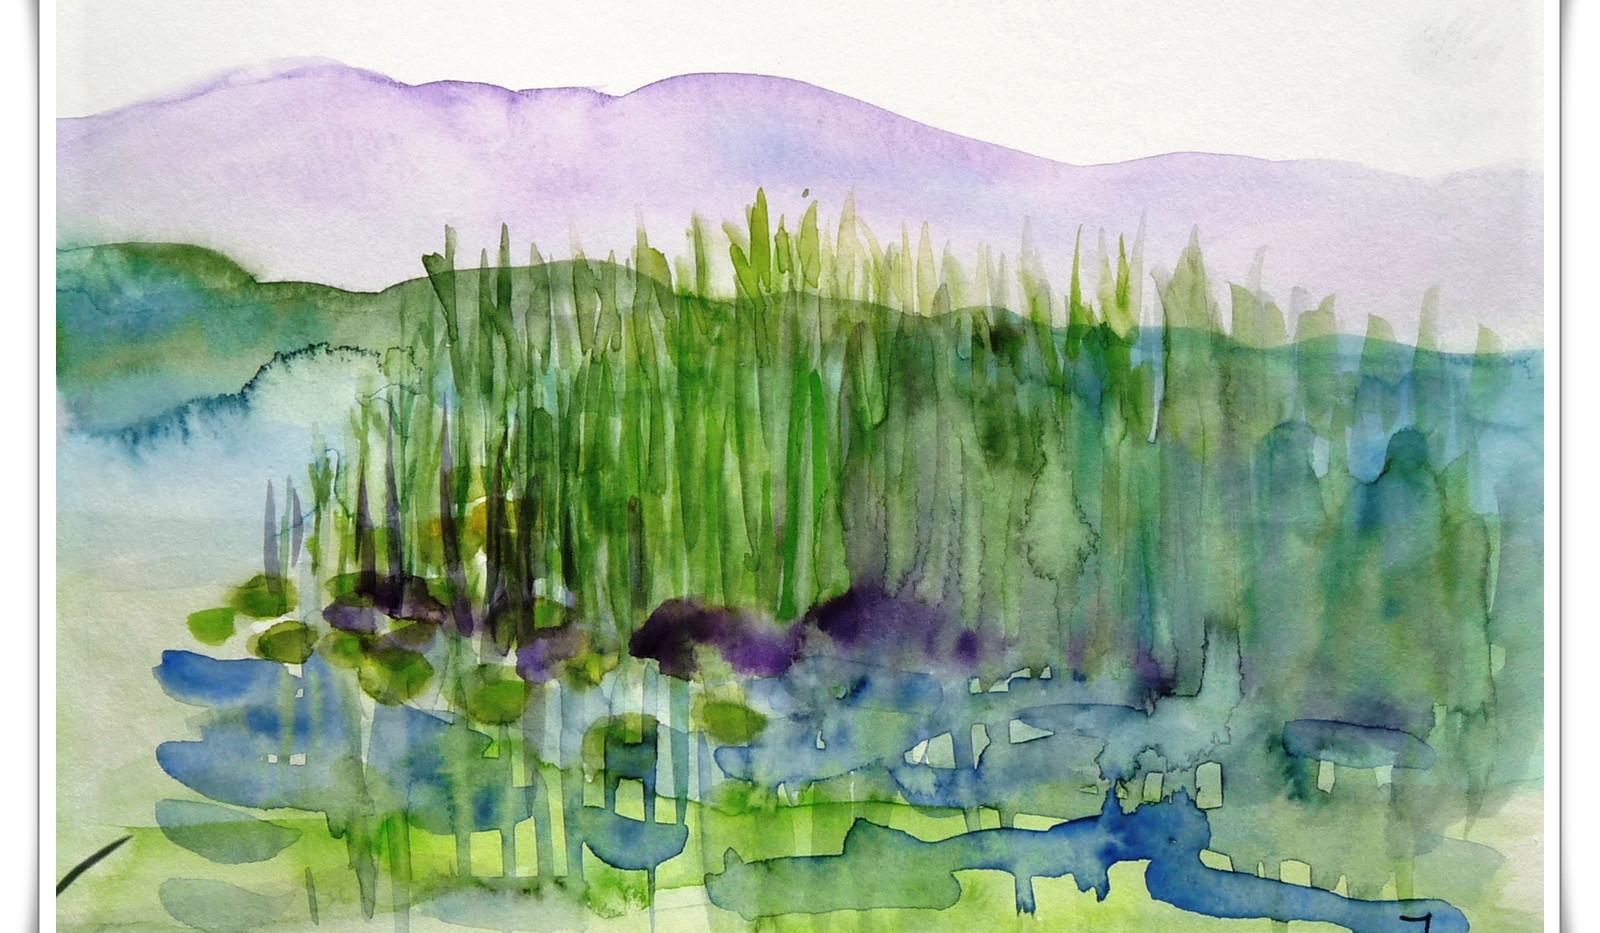 Landschaften_2011020001.JPG